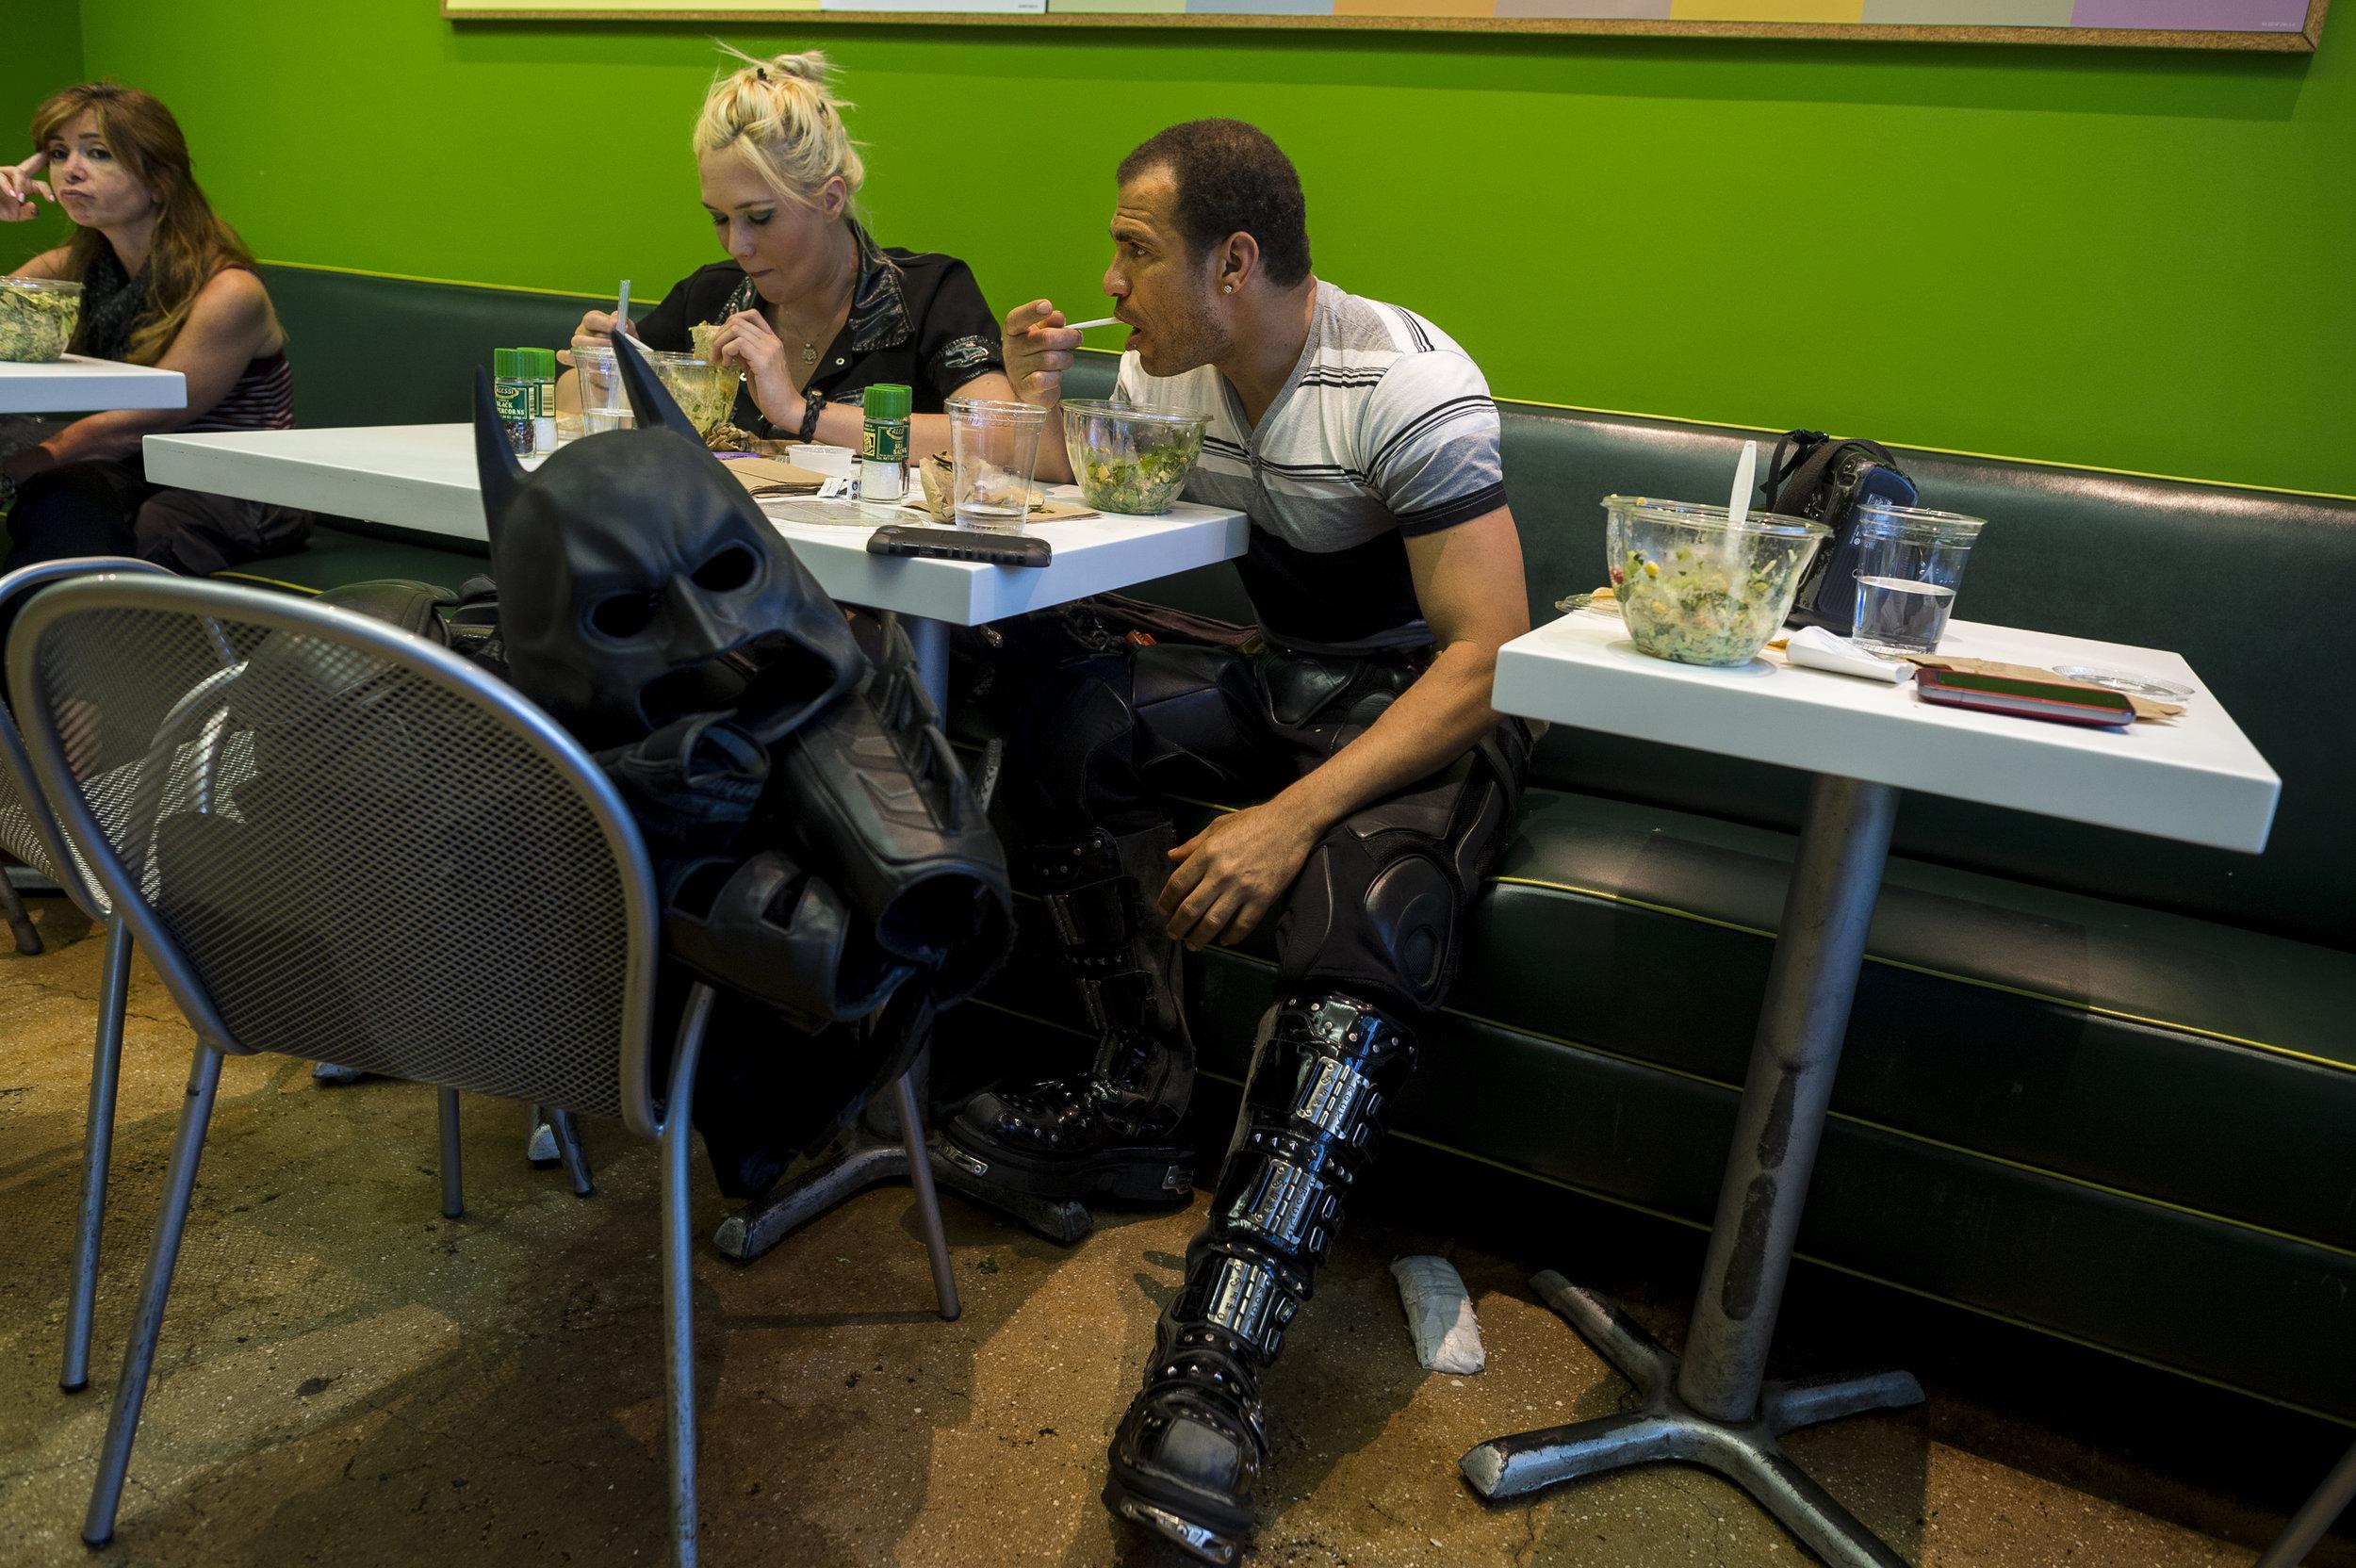 Jose and Elizabeth break for lunch.